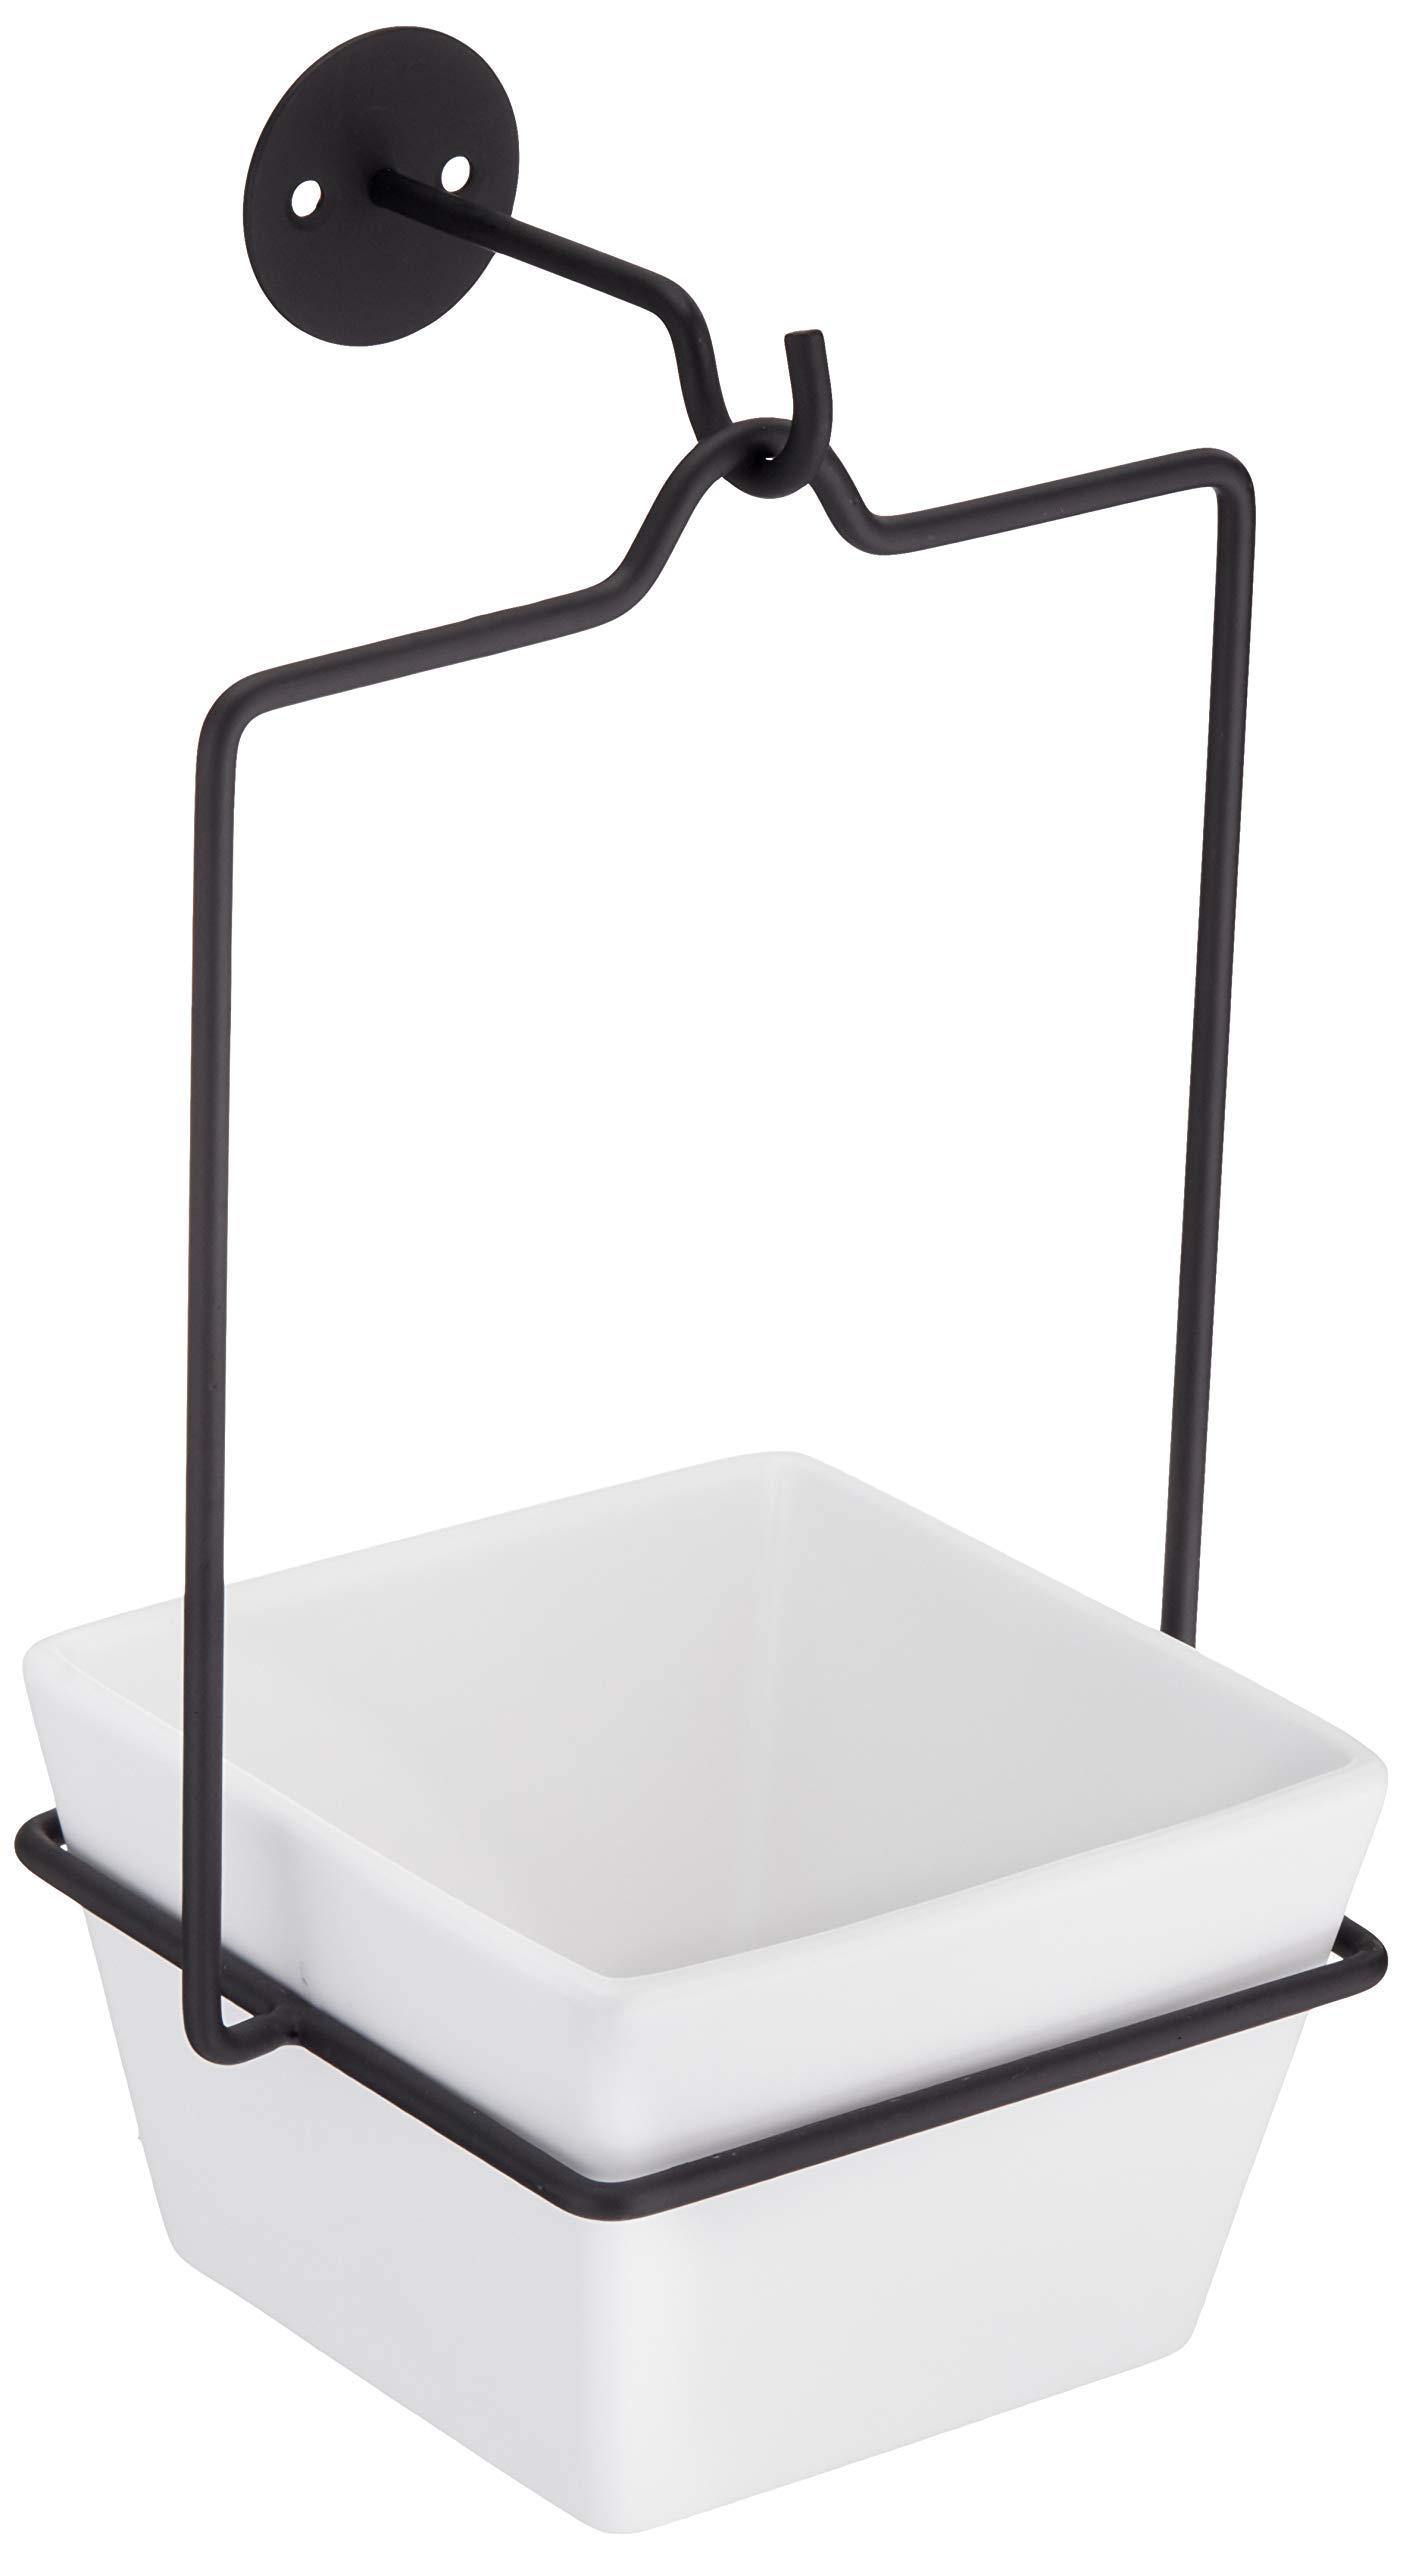 AmazonBasics Hanging Planter, Square - White/Black (3-Pack)